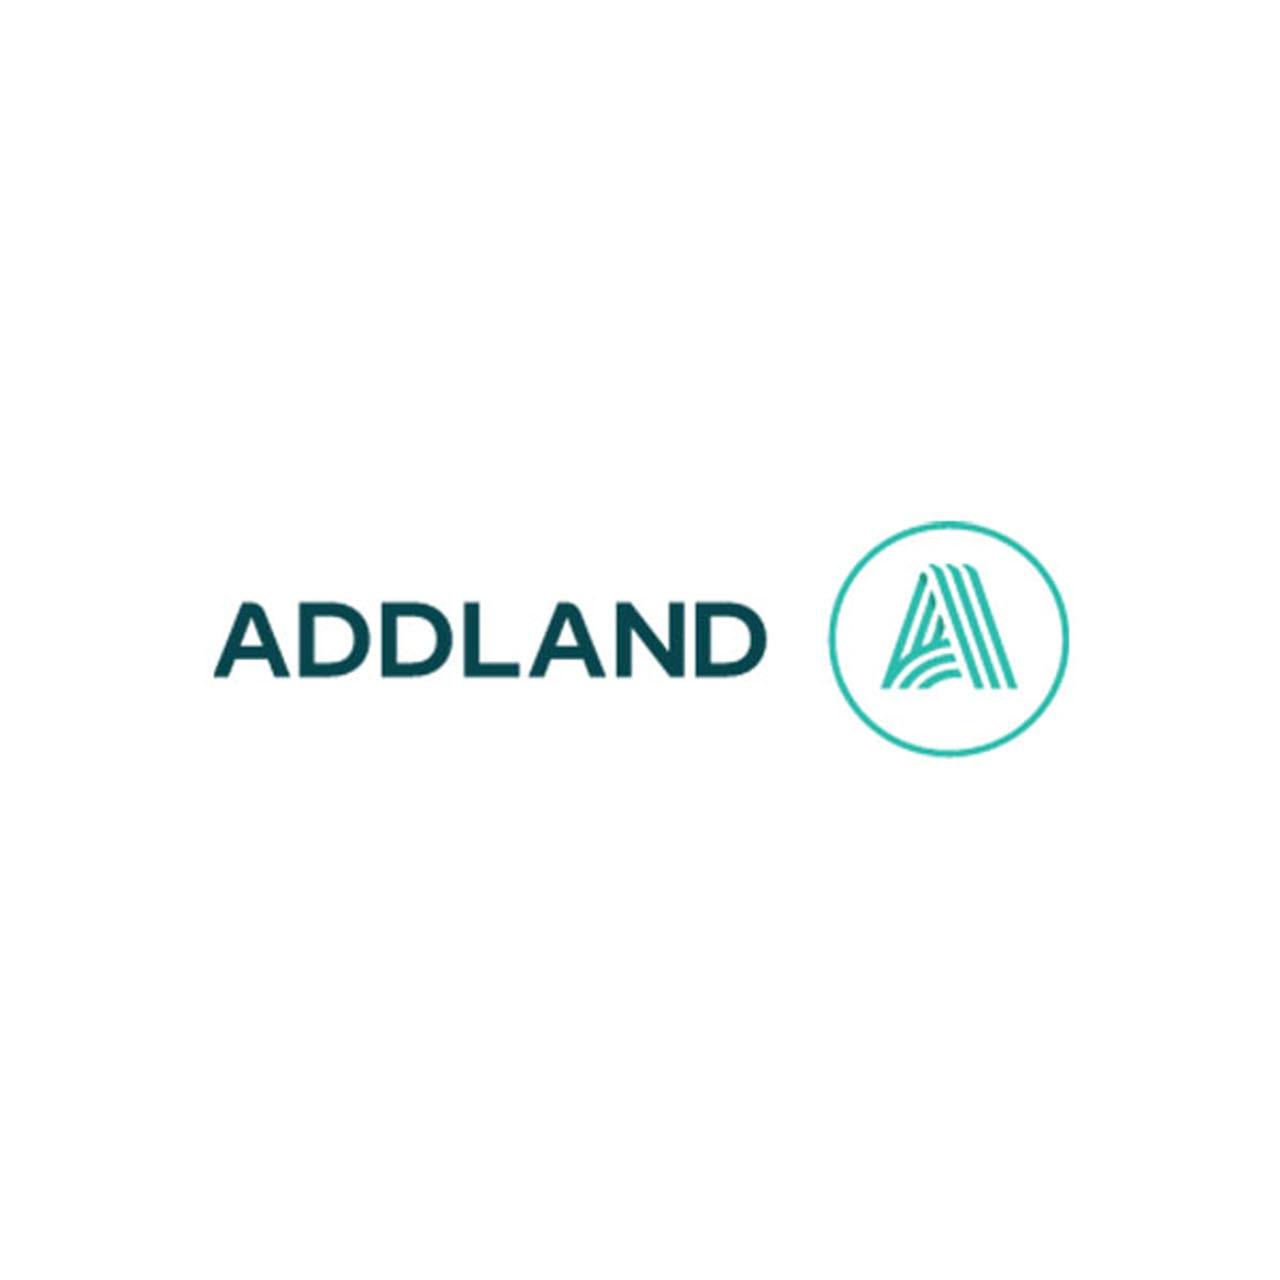 Addland